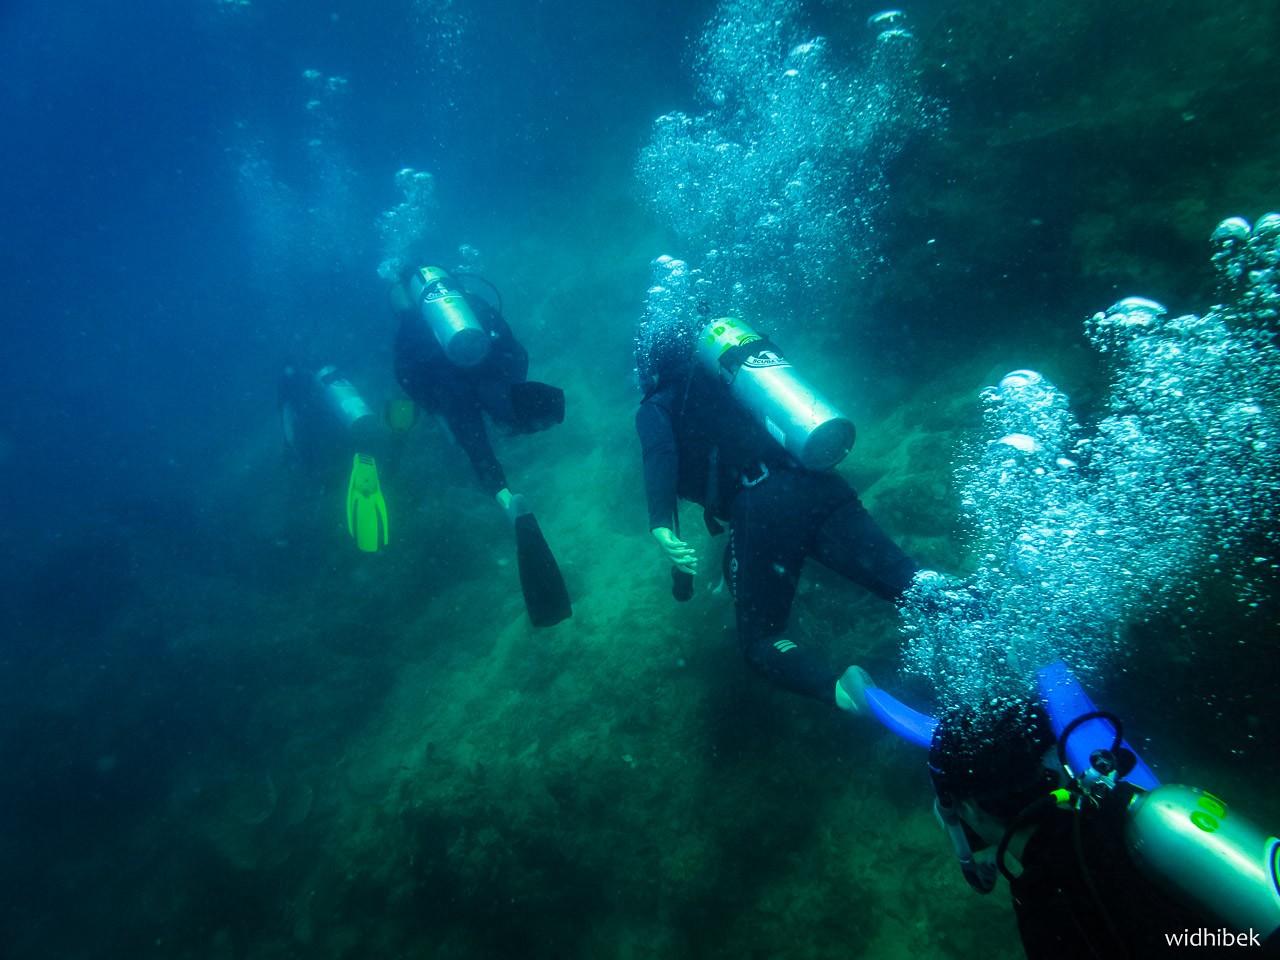 bawah laut 2 - Selamat Datang di Bawah Laut